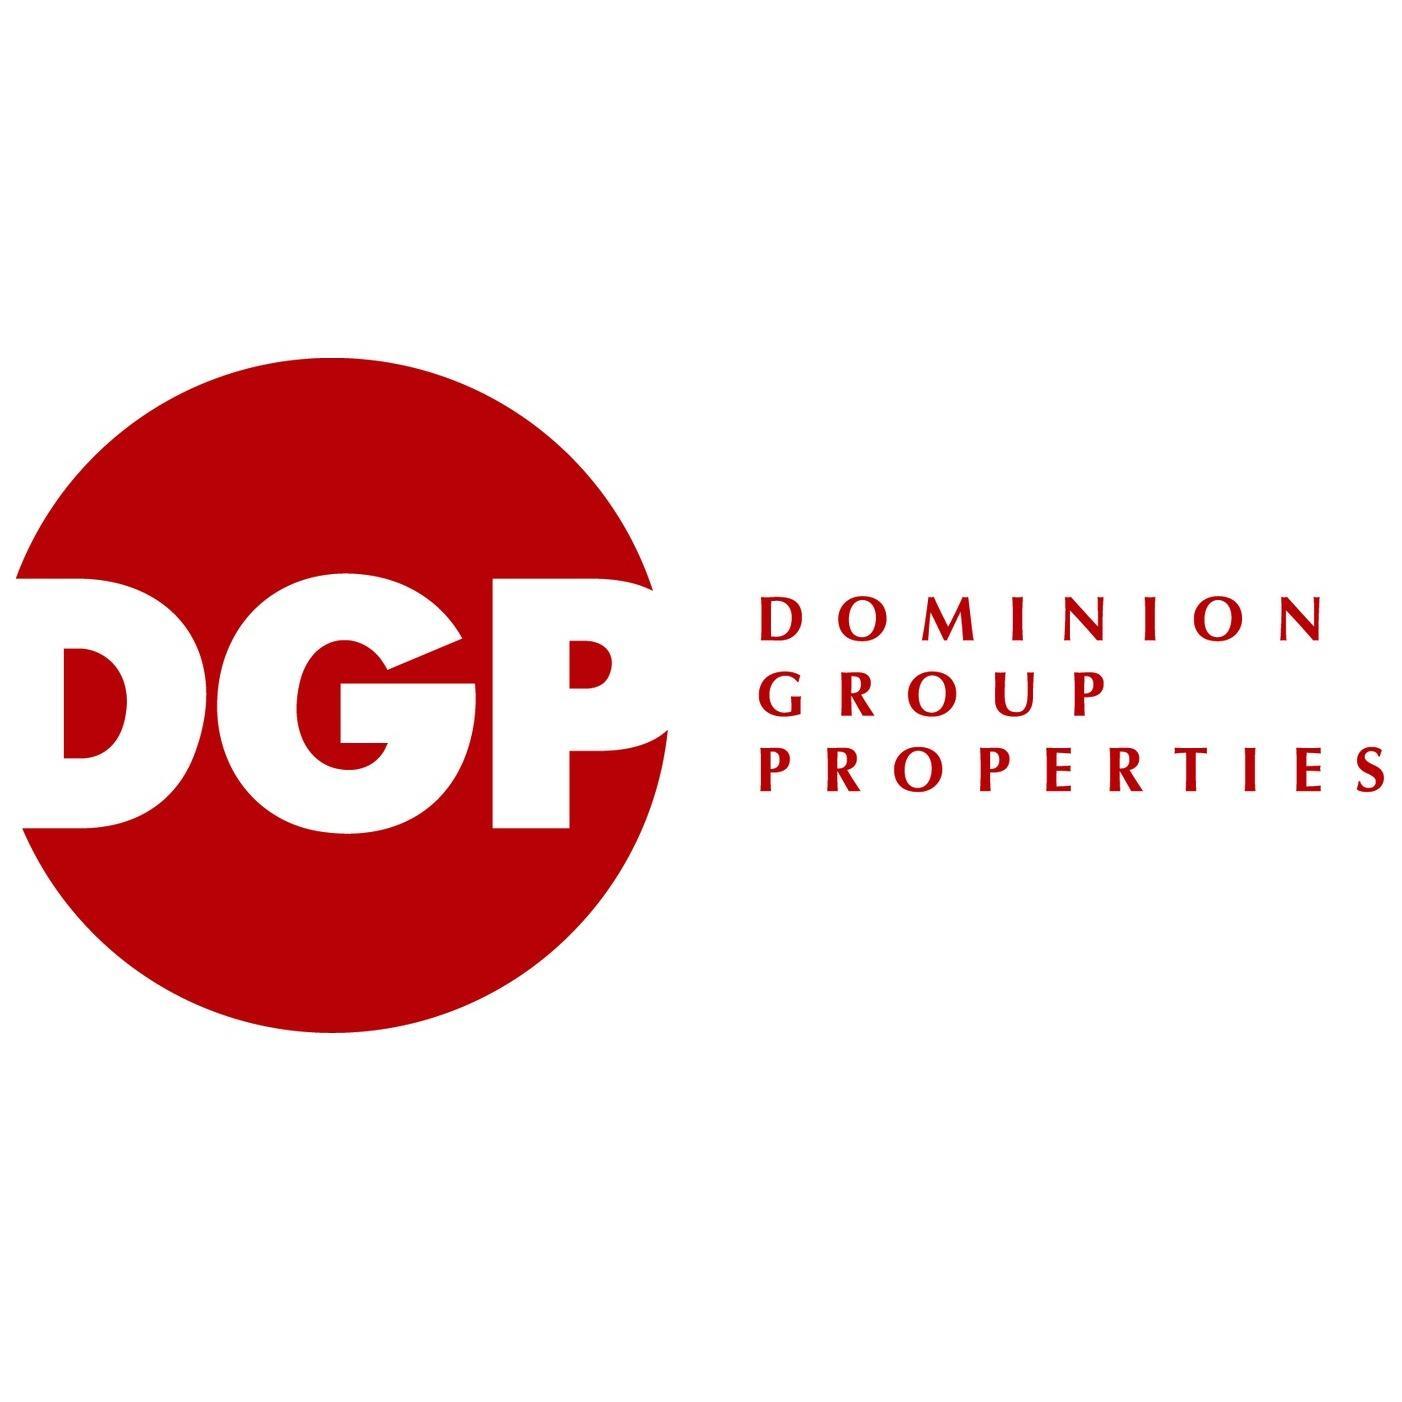 Jonathan Baer | Dominion Group Properties